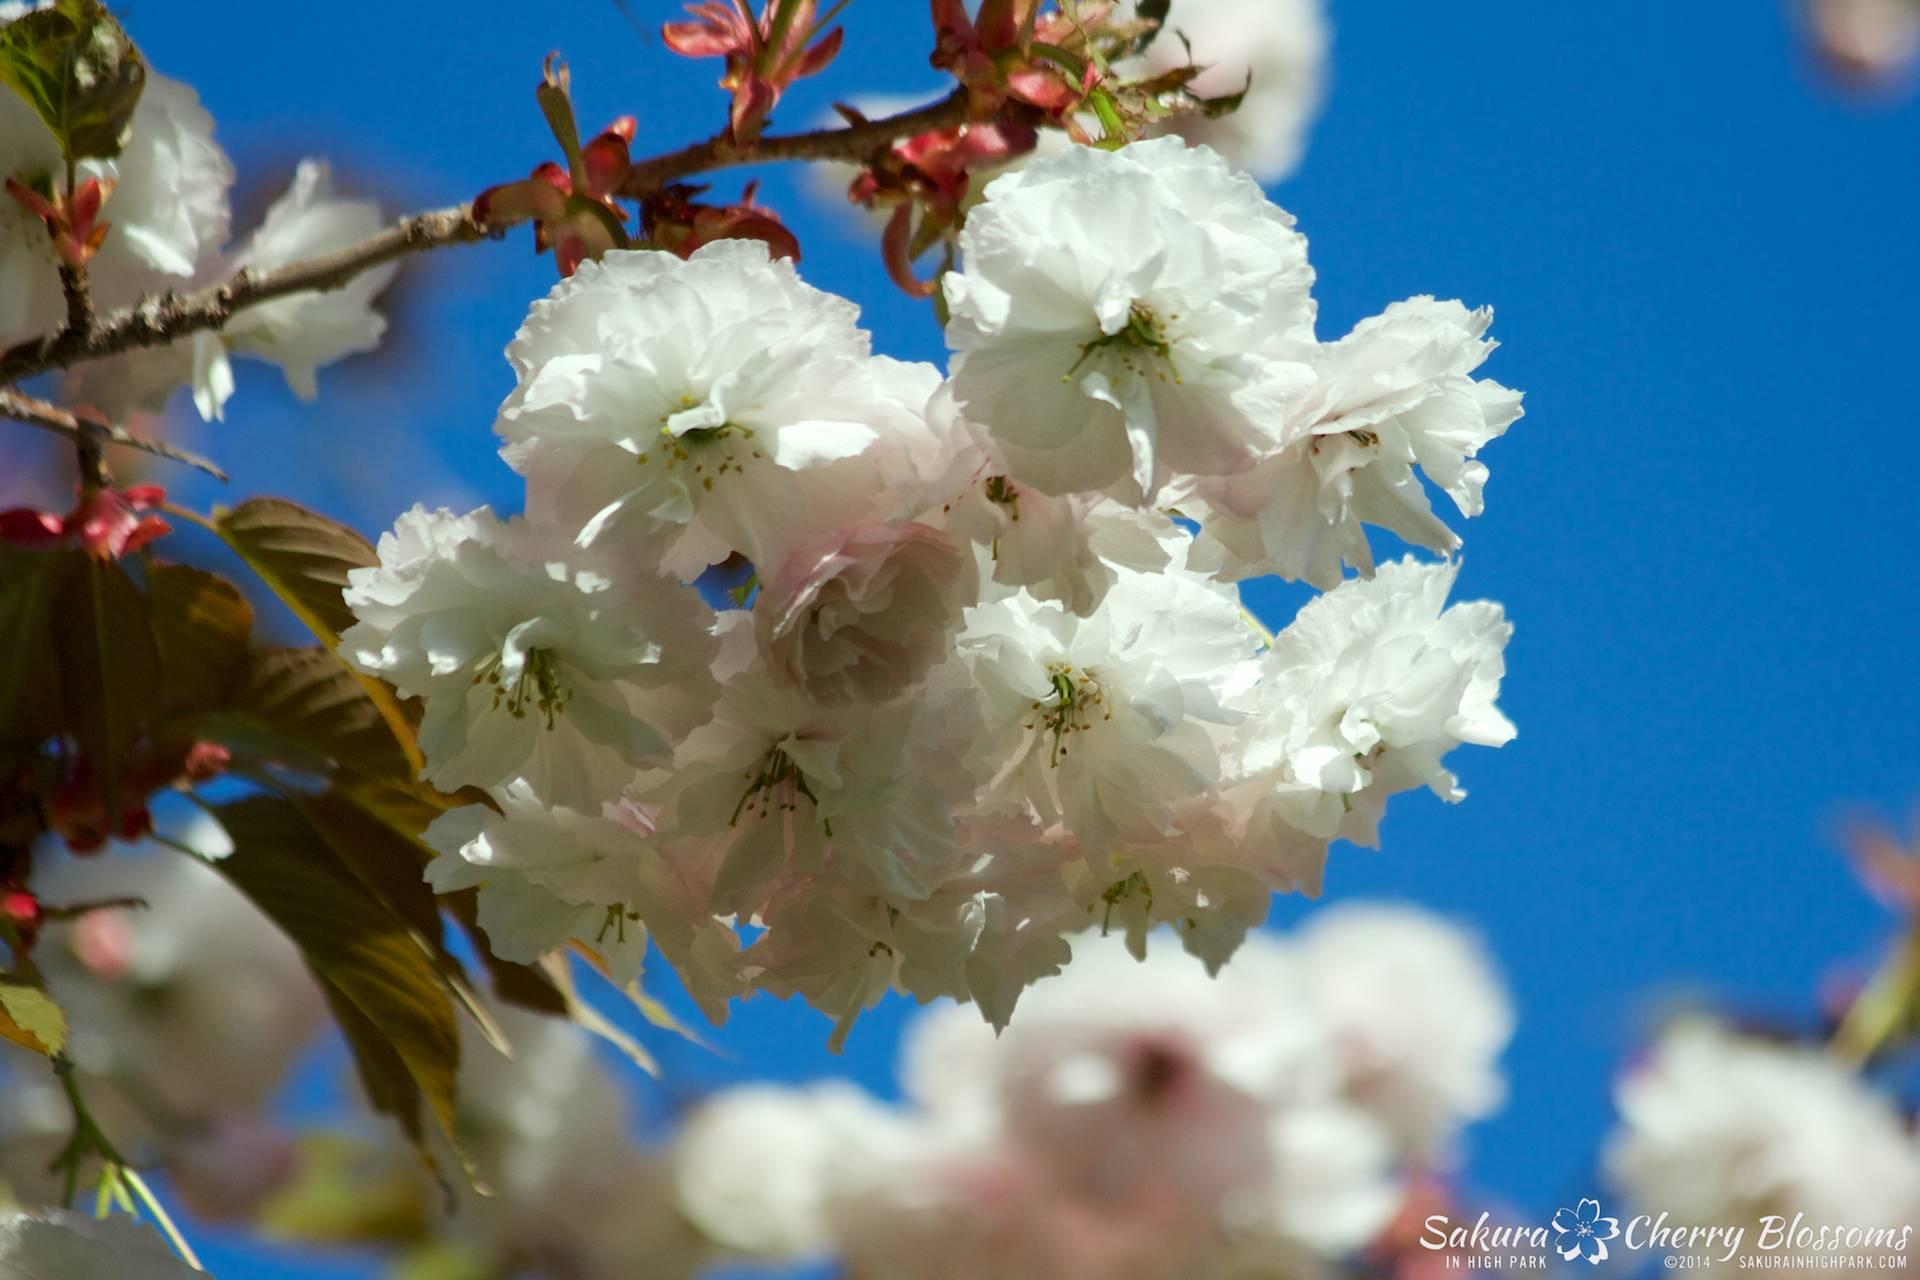 SakuraInHighPark-May2414-373.jpg